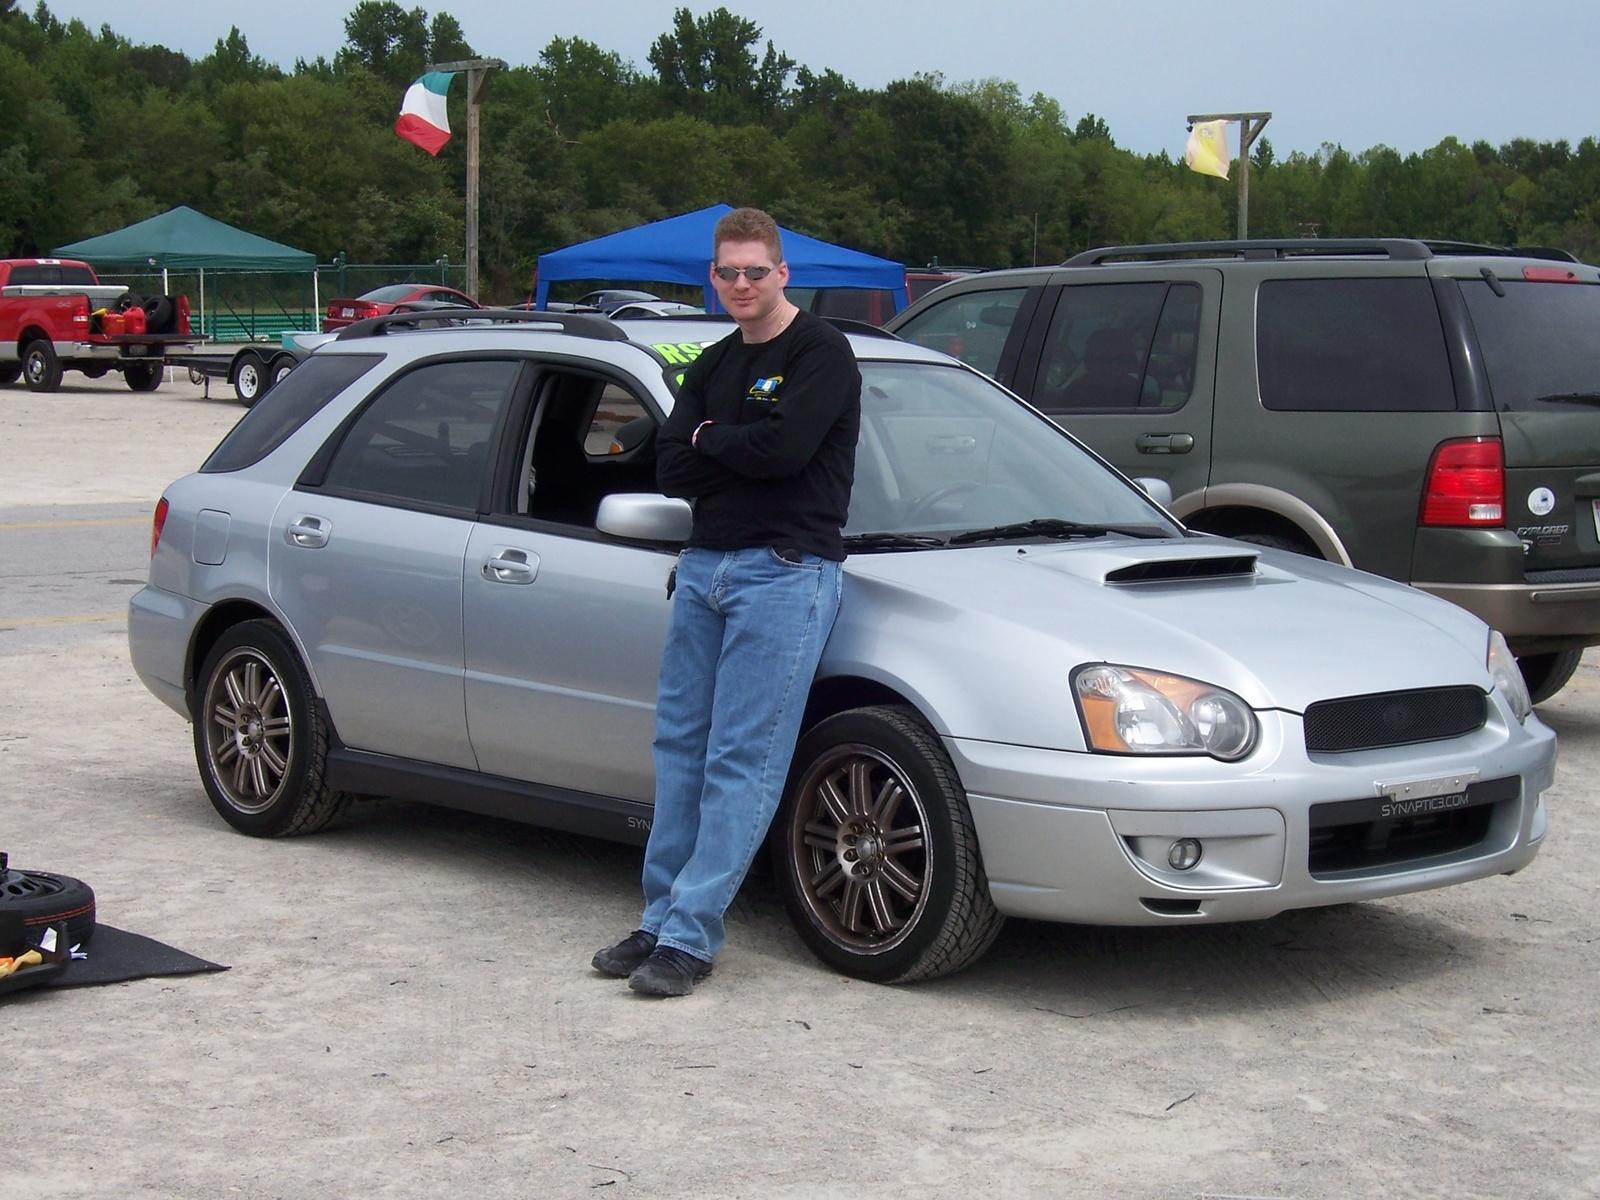 Picture of 2004 subaru impreza wrx wagon exterior